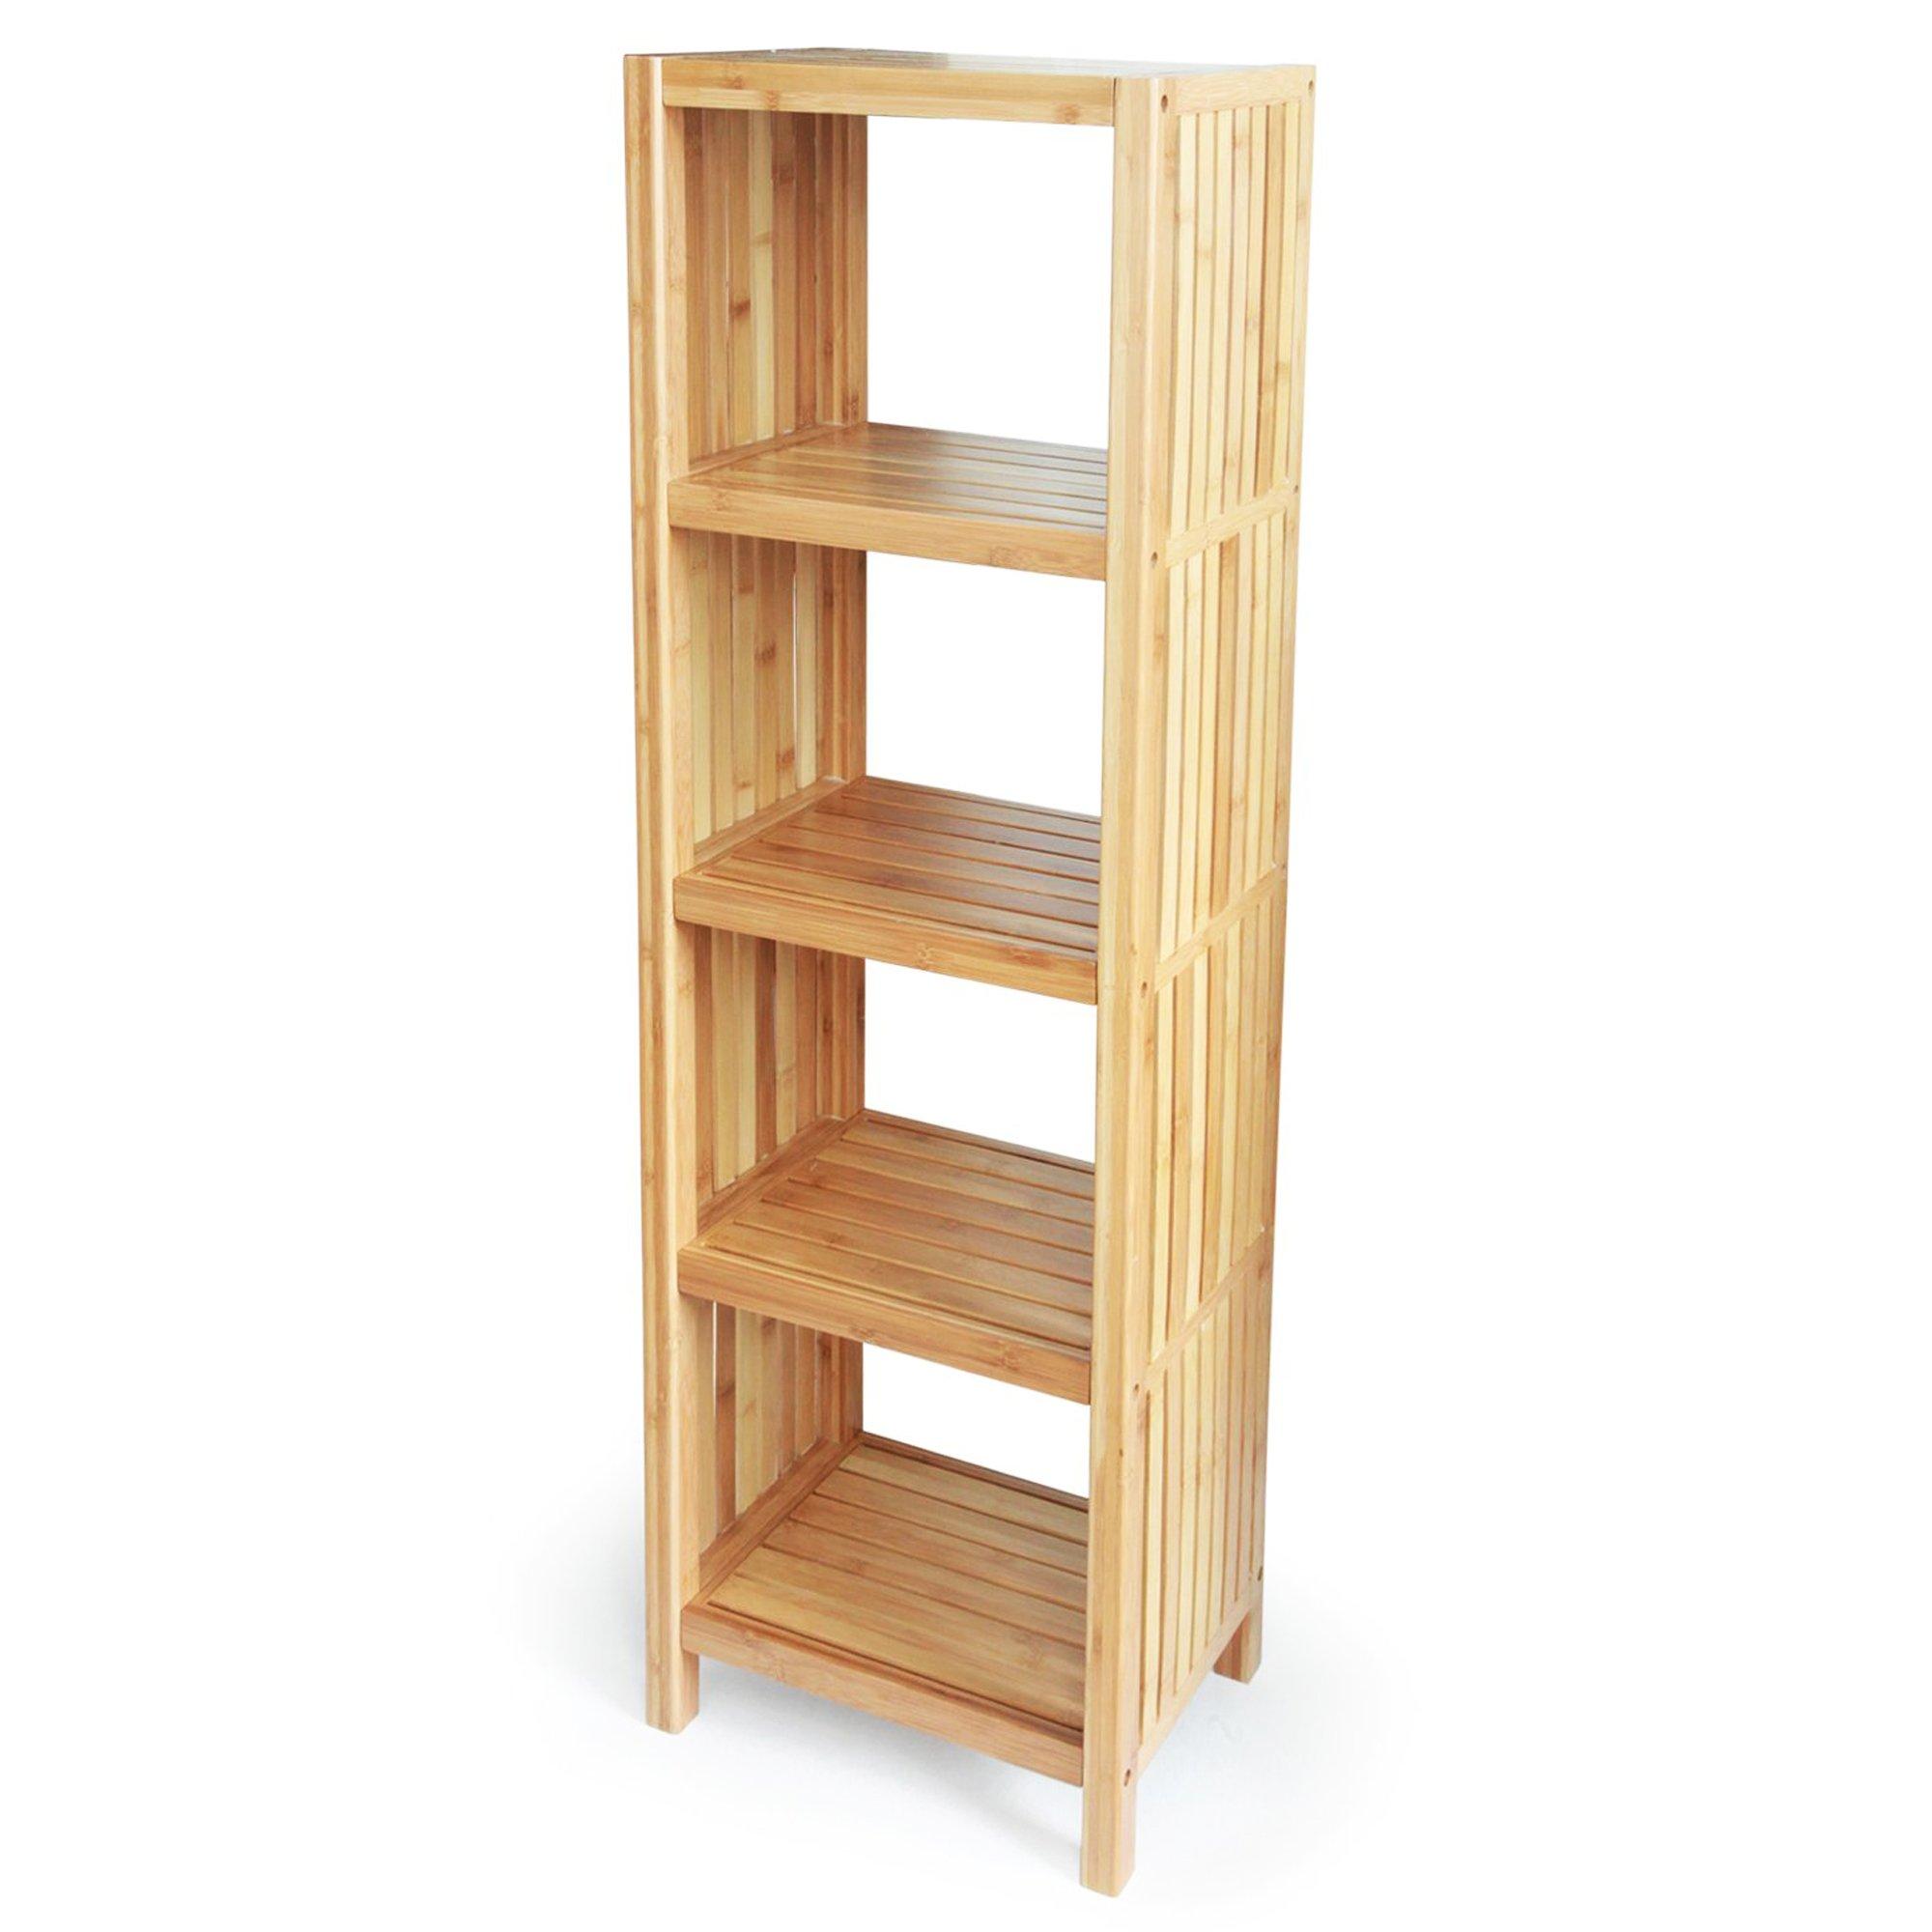 ToiletTree Products Deluxe Bamboo Freestanding Bathroom Organizing Shelf, 5-Tier Shelf